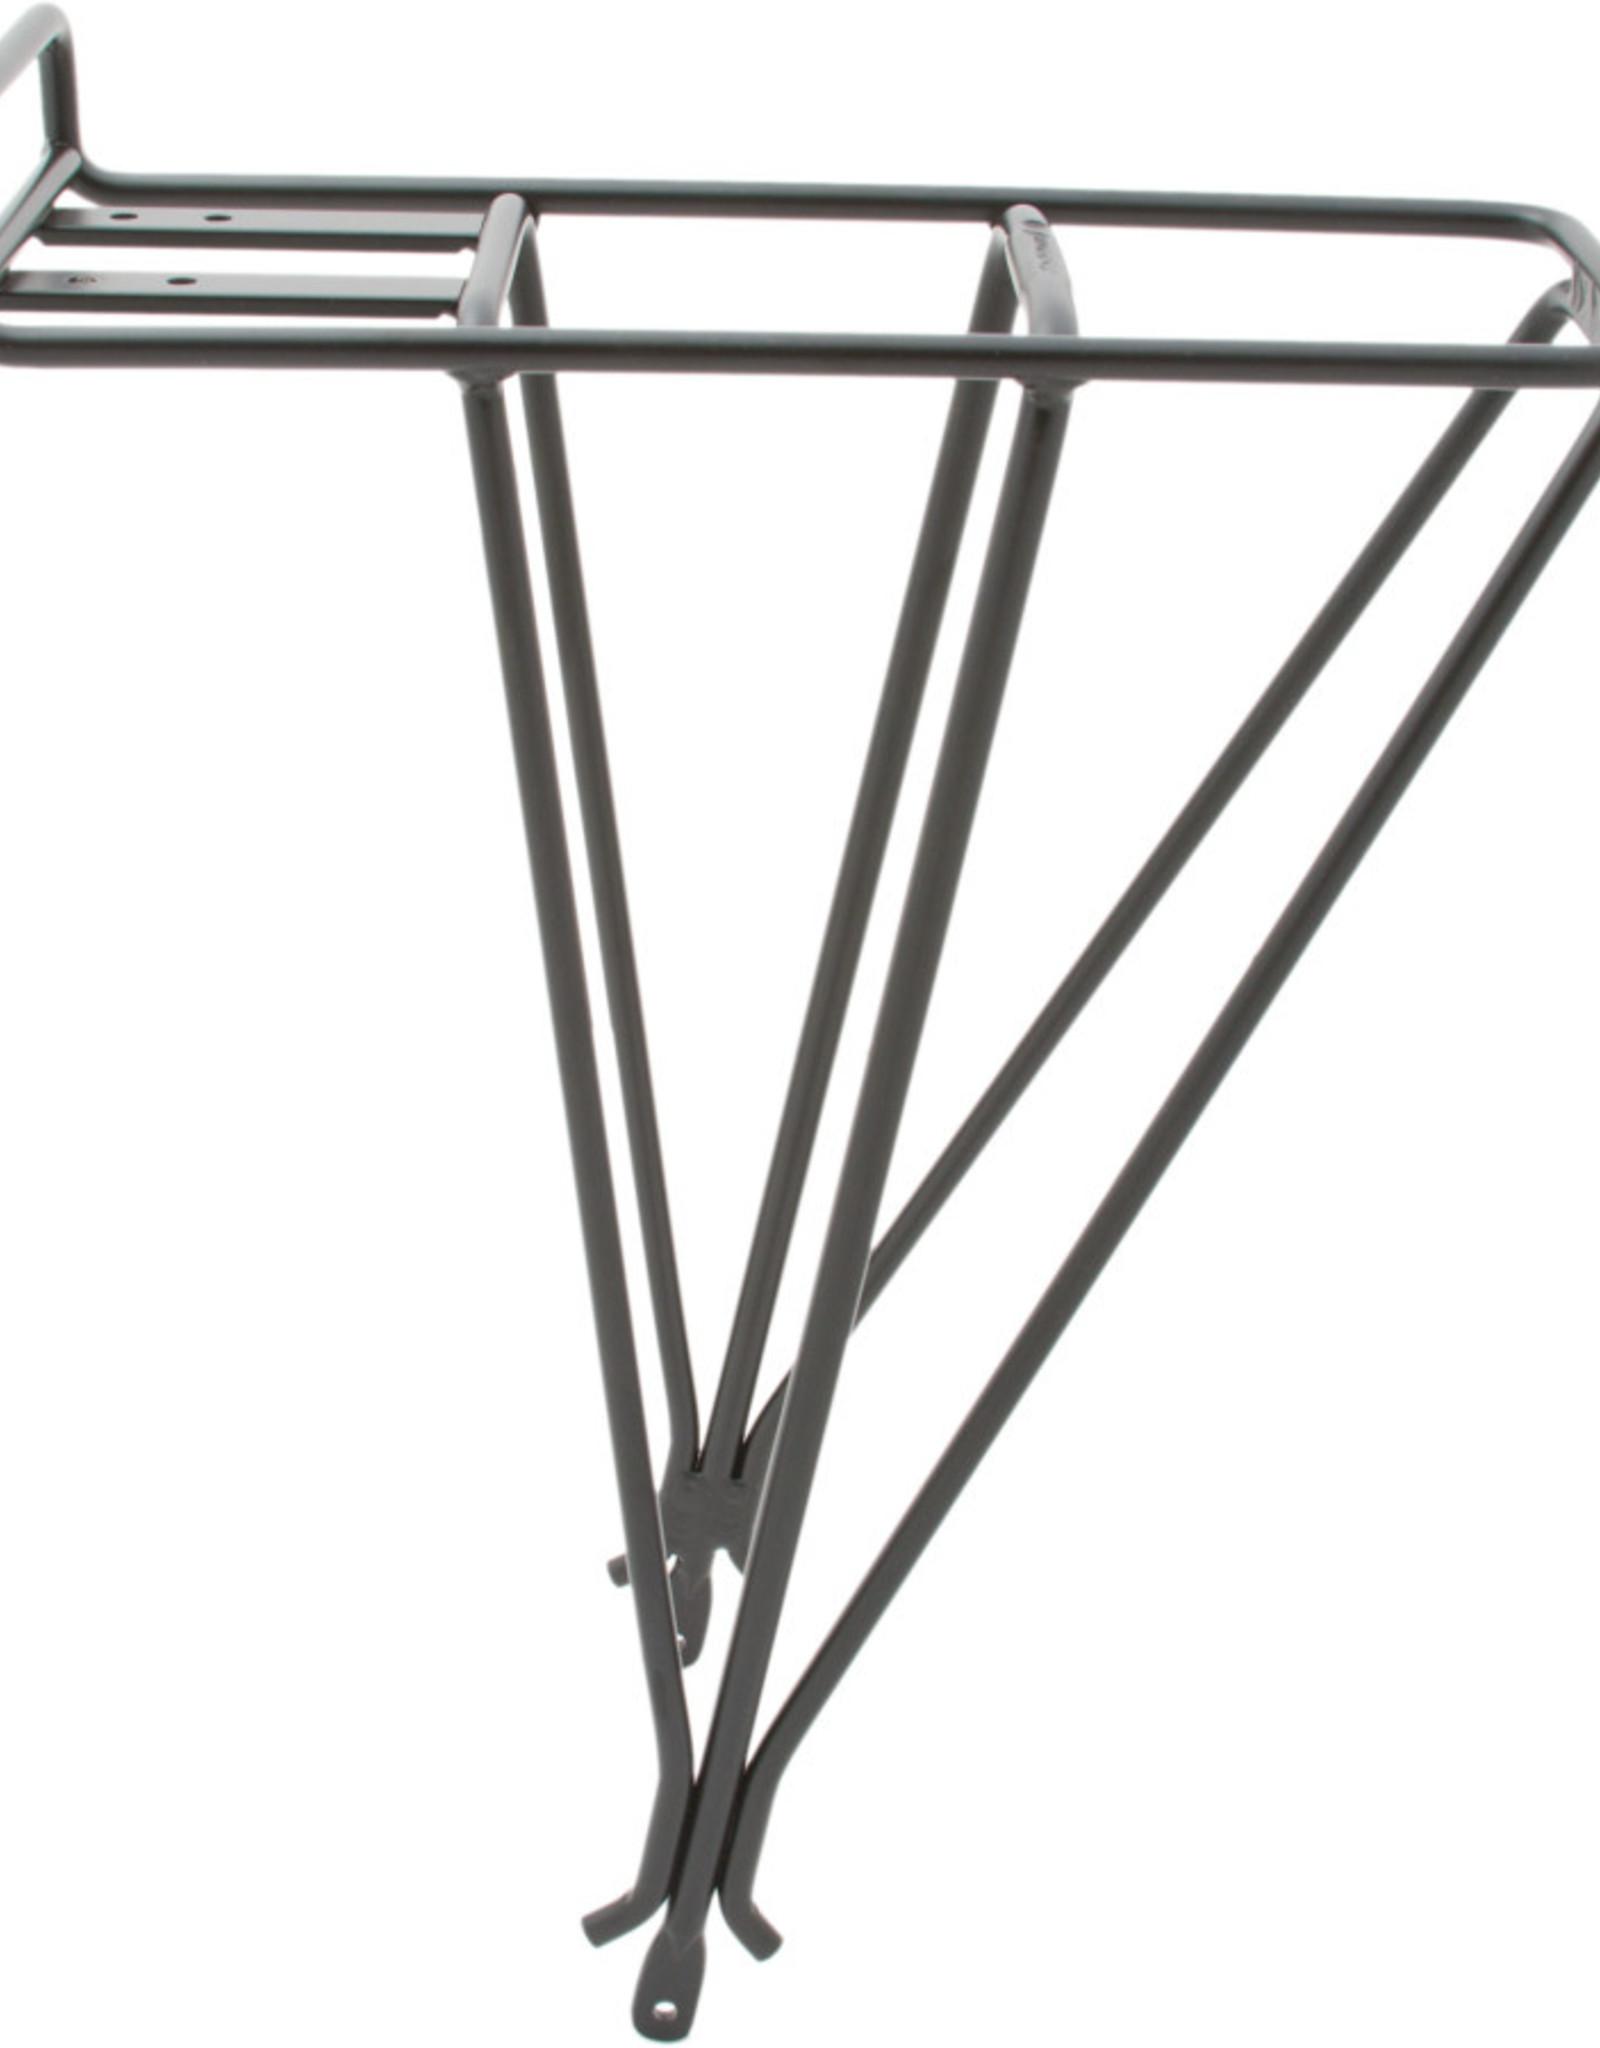 Rack - Blackburn EXPEDITION Rear Rack Non Disc (Black)